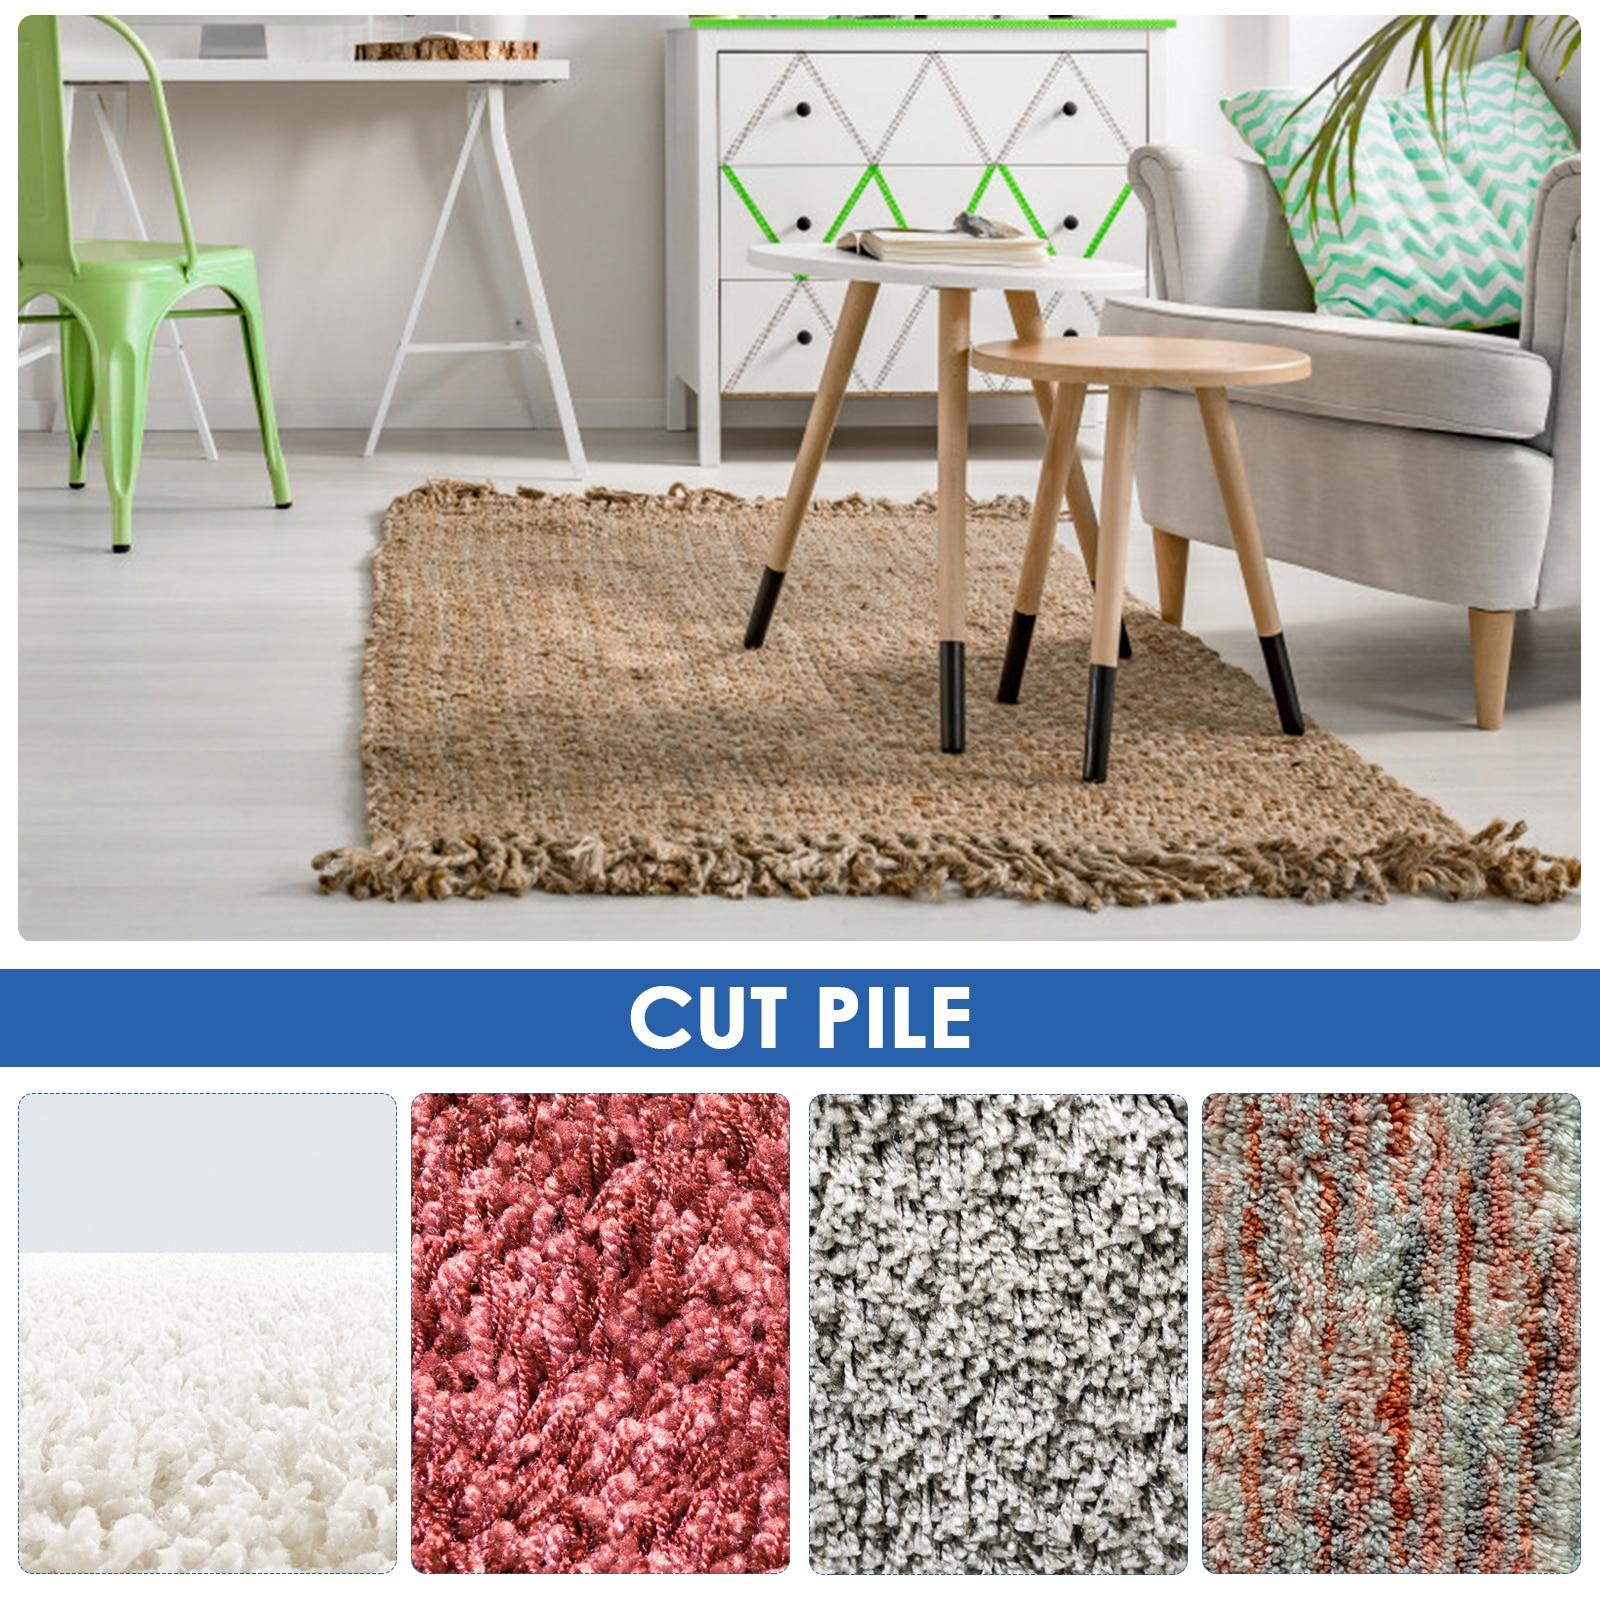 Electric Carpet Tufting Gun Carpet Weaving Machine Flocking Machine Industrial Embroidery Machine Cut Pile / Loop Pile enlarge